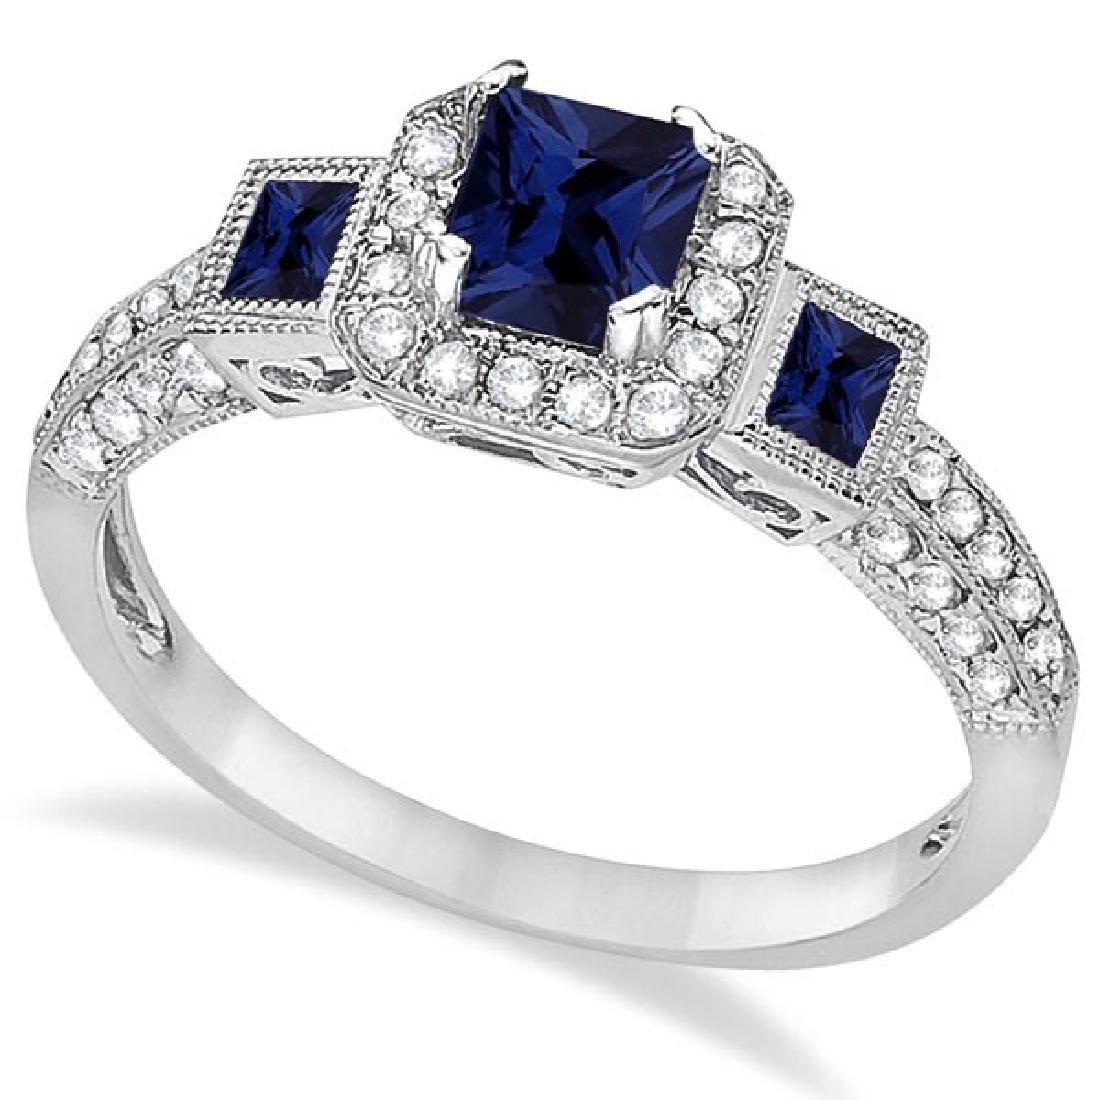 Blue Sapphire and Diamond Engagement Ring 14k White Gol